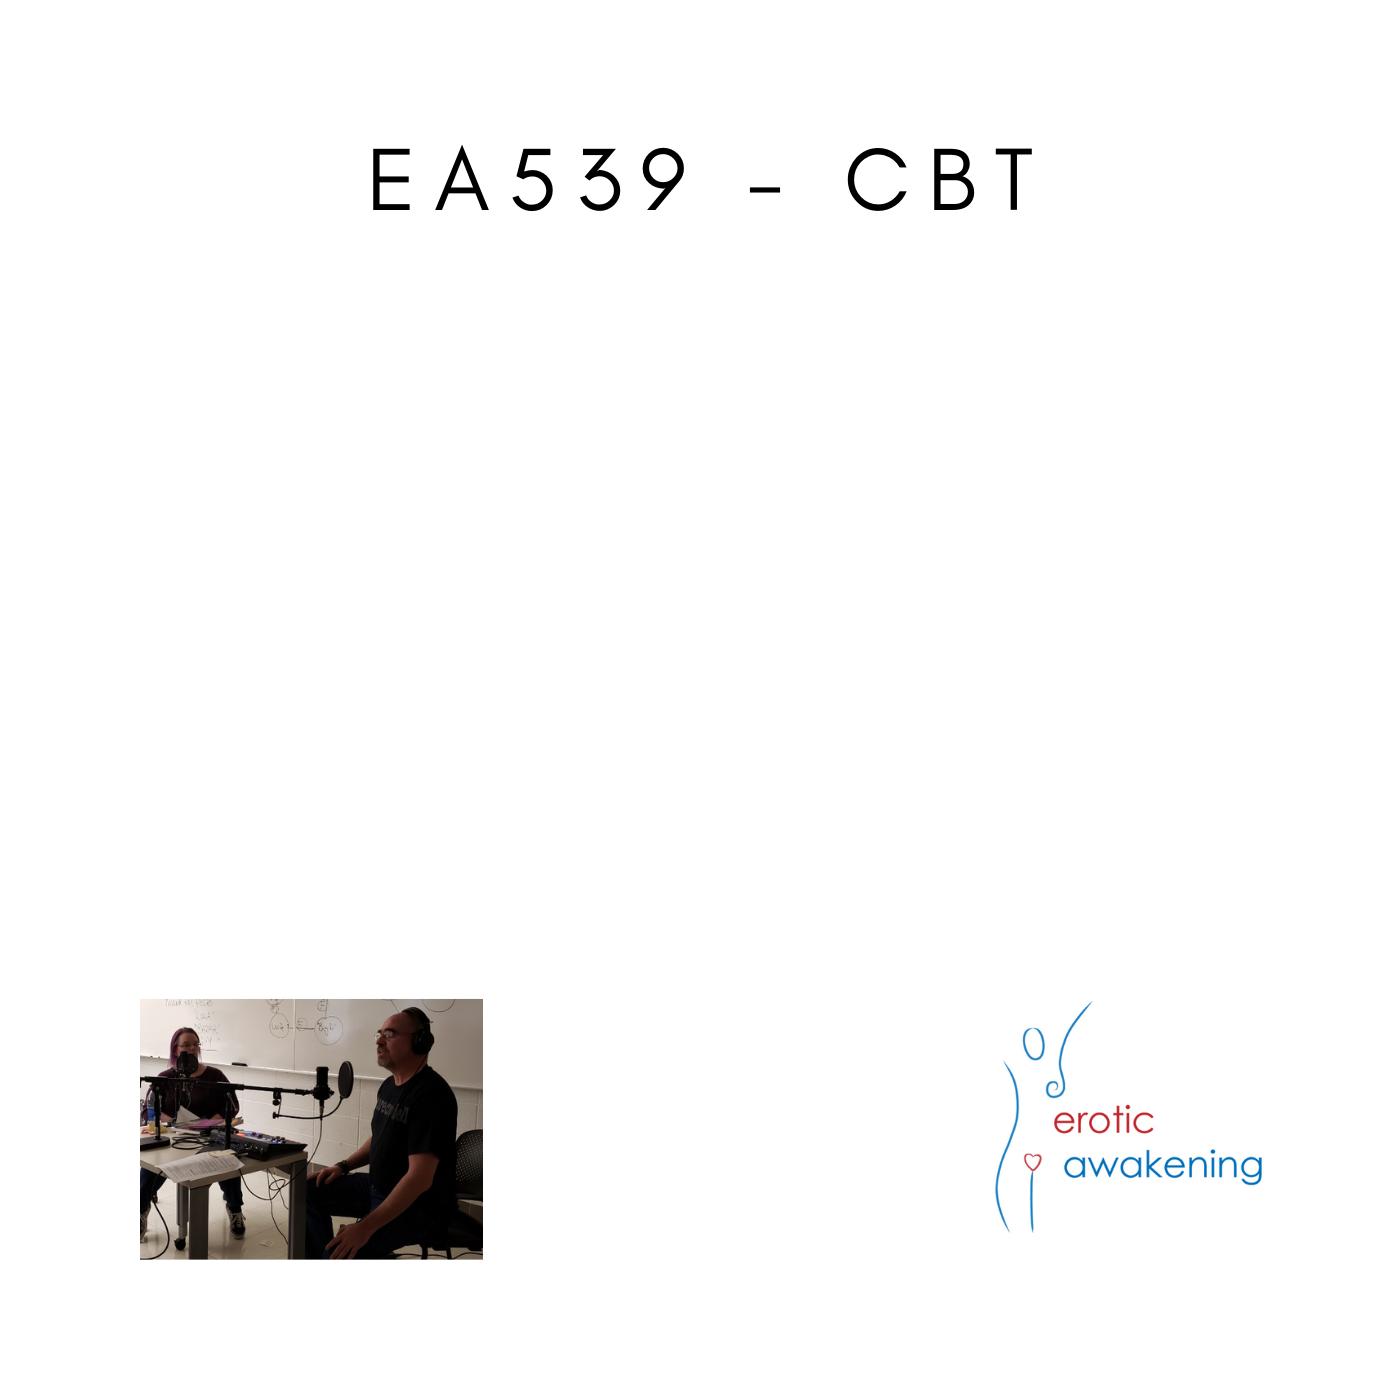 Erotic Awakening Podcast - EA539 - CBT